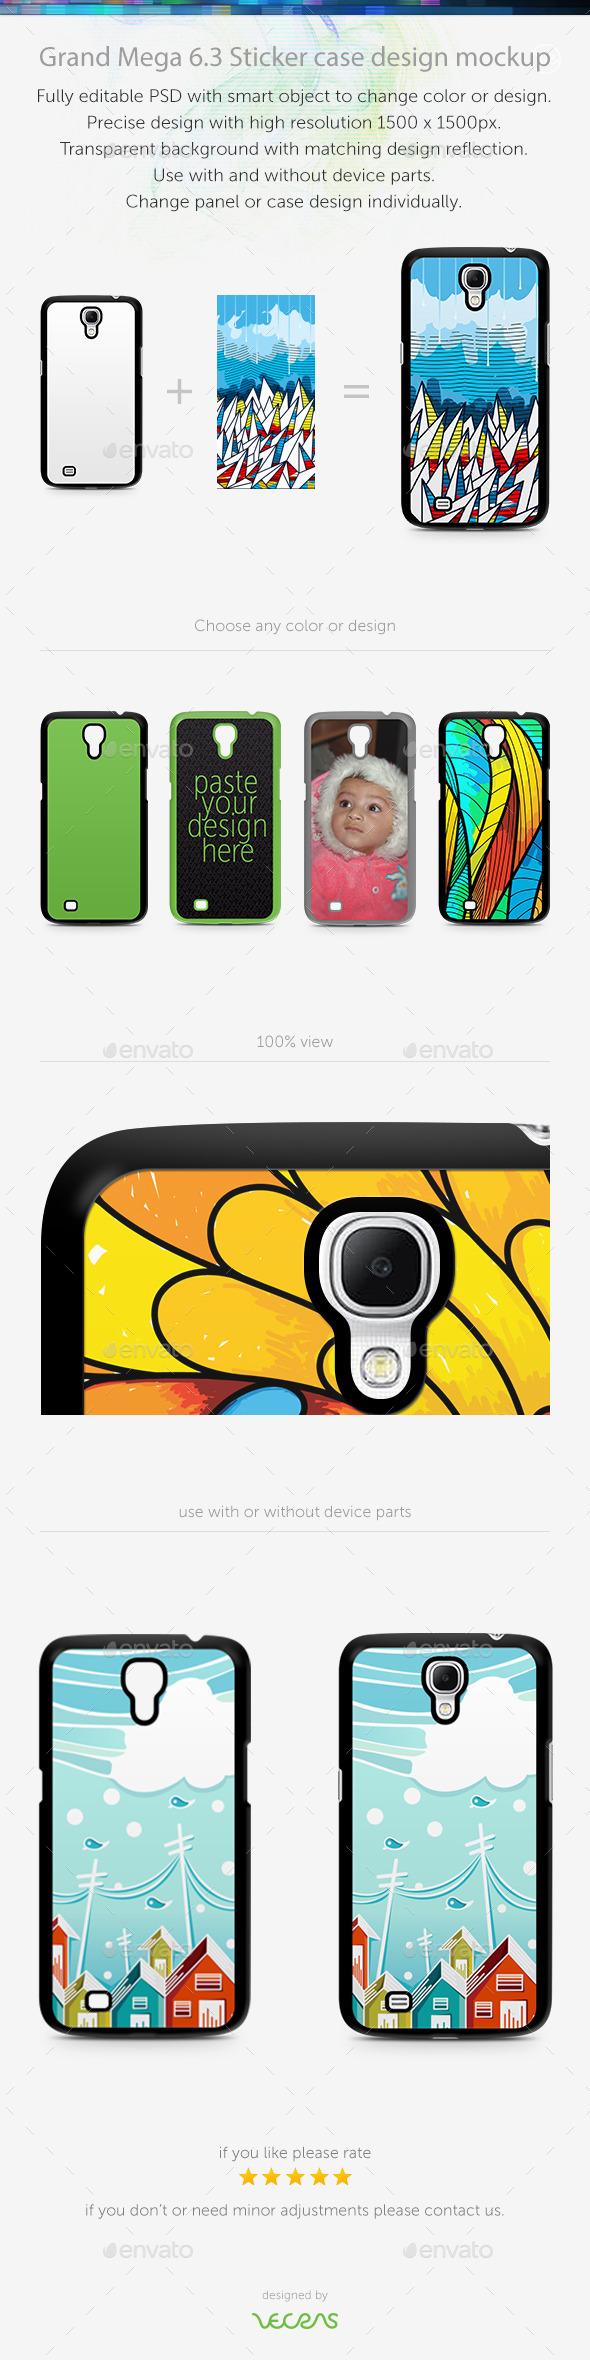 Grand Mega 6.3 Sticker Case Design Mockup